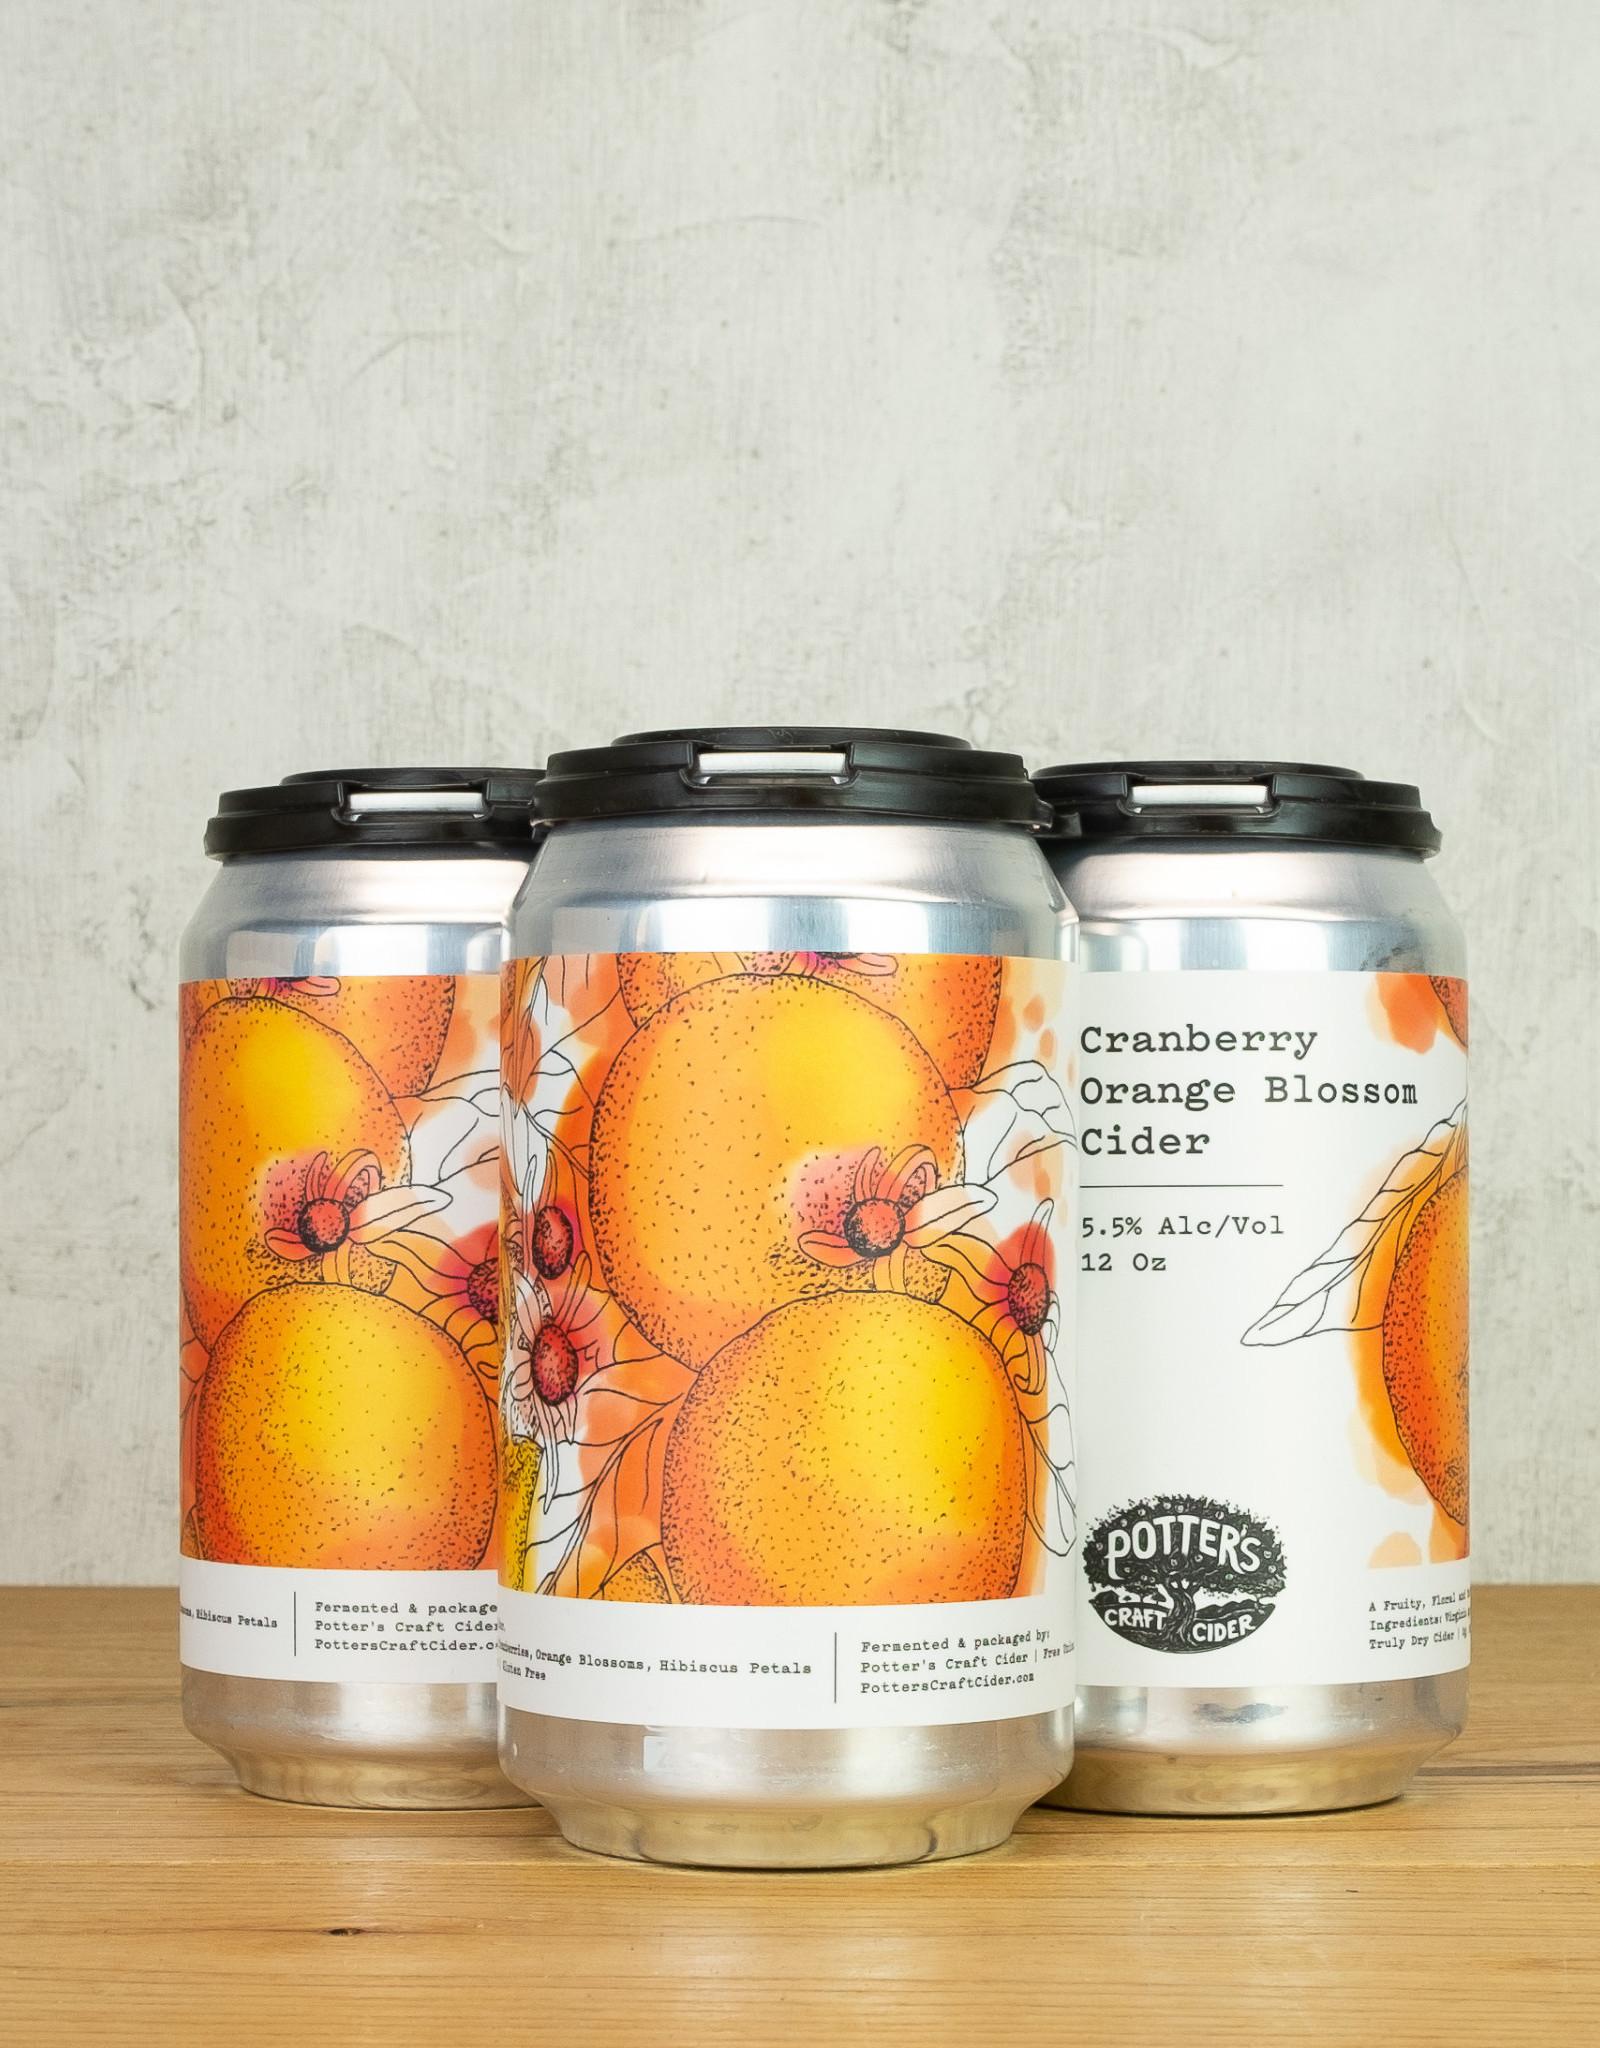 Potters Cranberry Orange 4pk